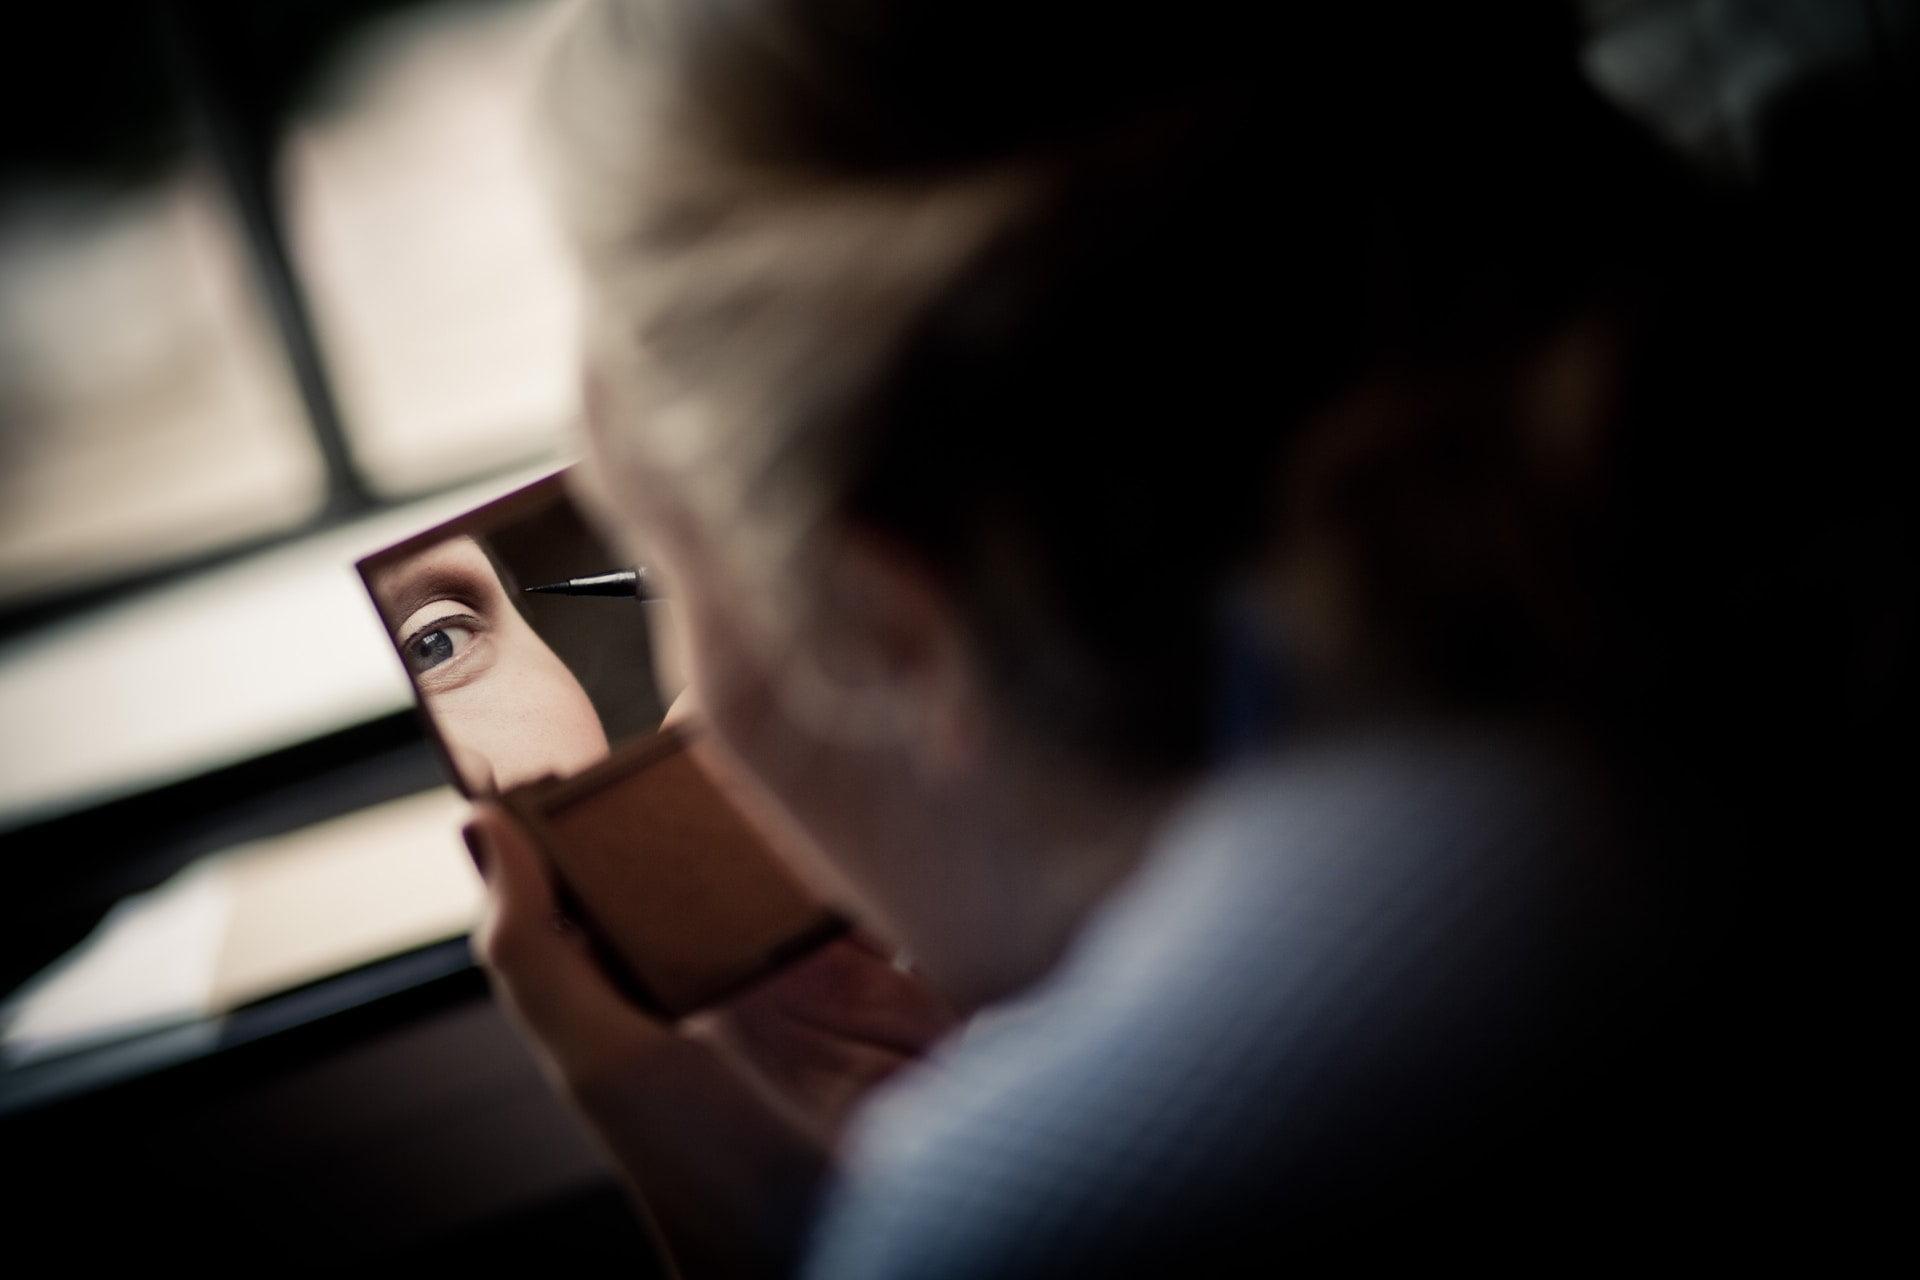 woman holding make up Mirror eye 1 自我介紹|鄭文鈺一行詩